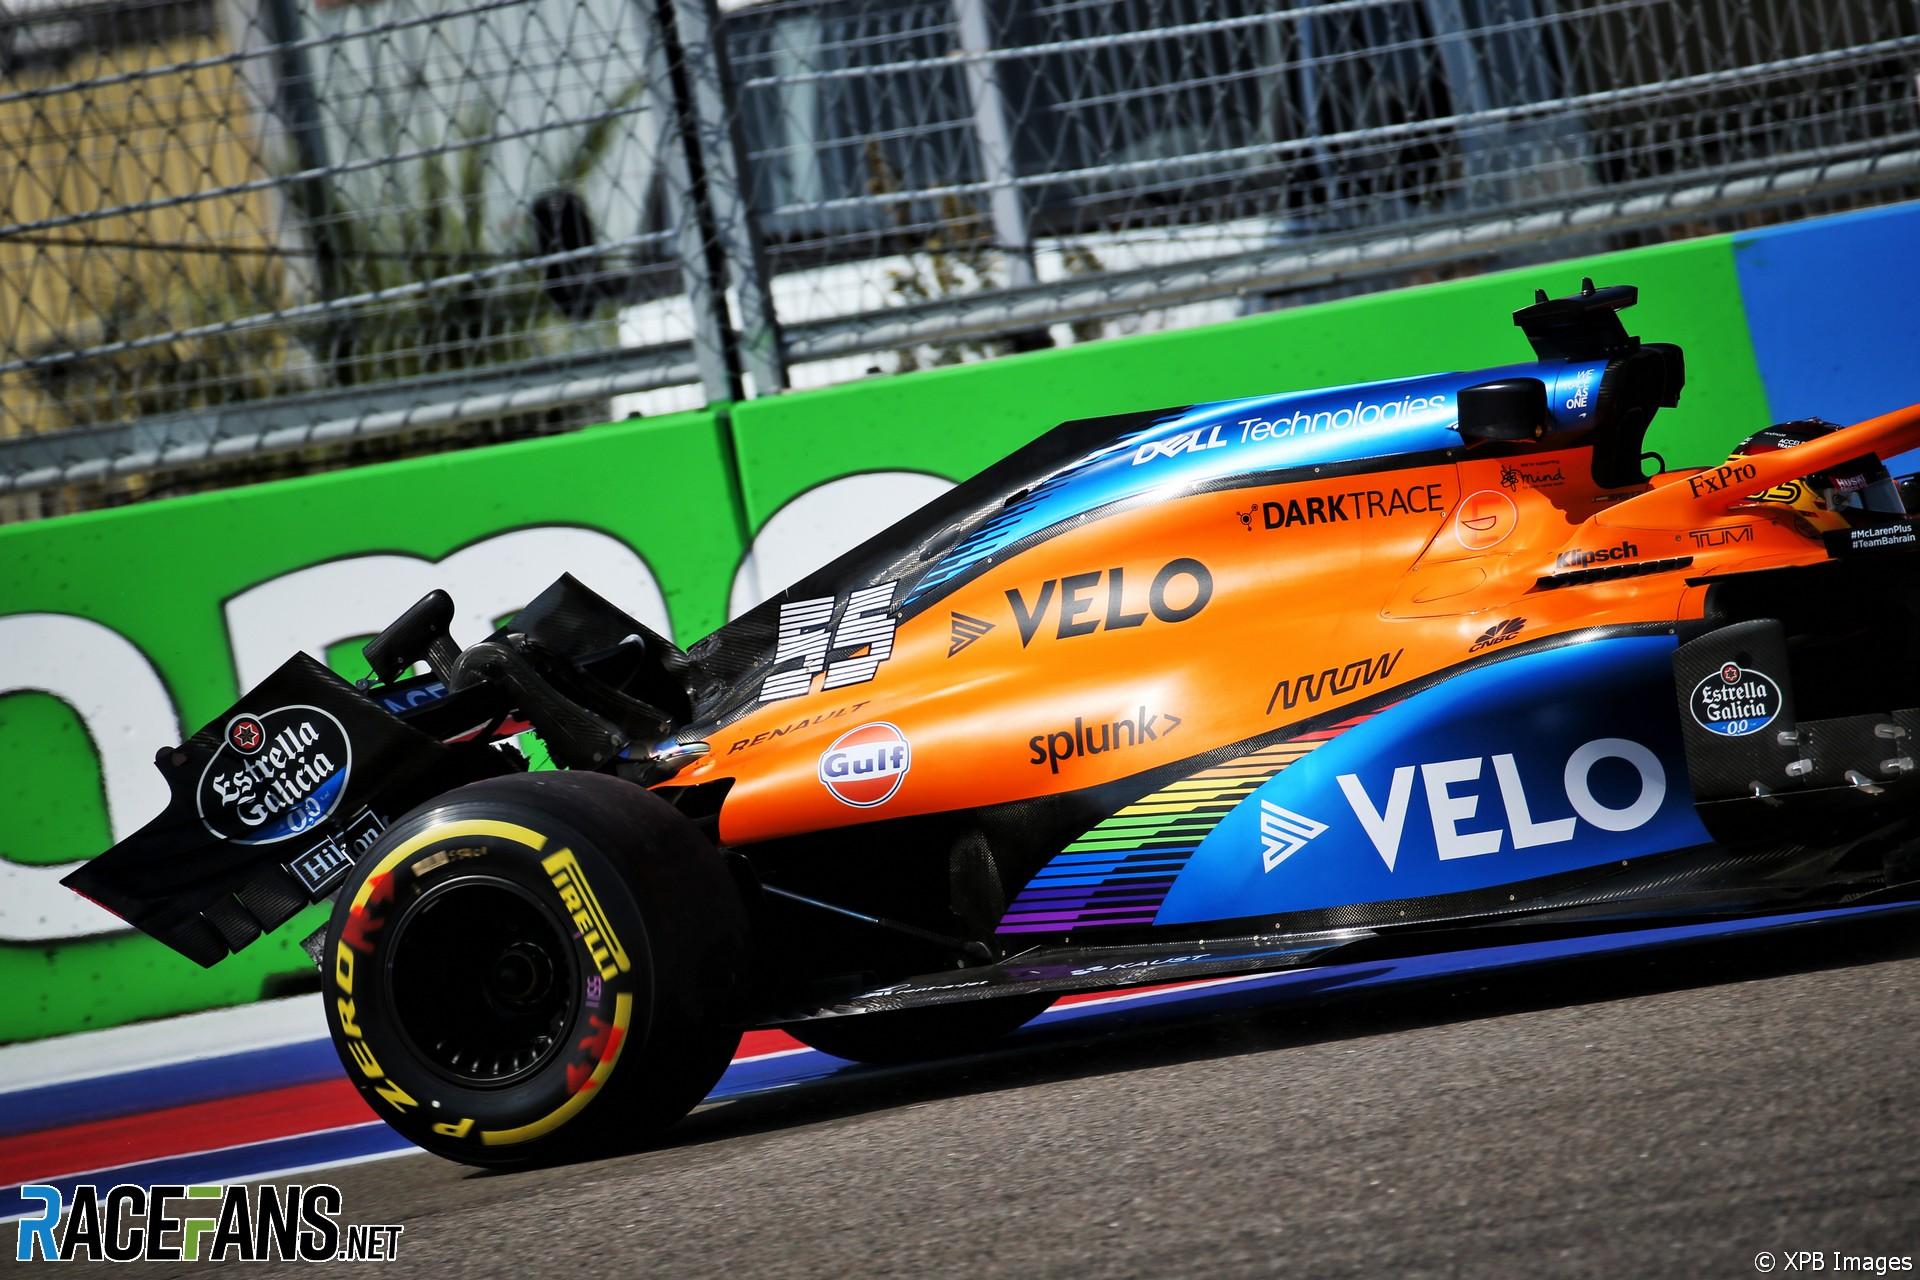 Carlos Sainz Jnr, McLaren, Sochi Autodrom, 2020